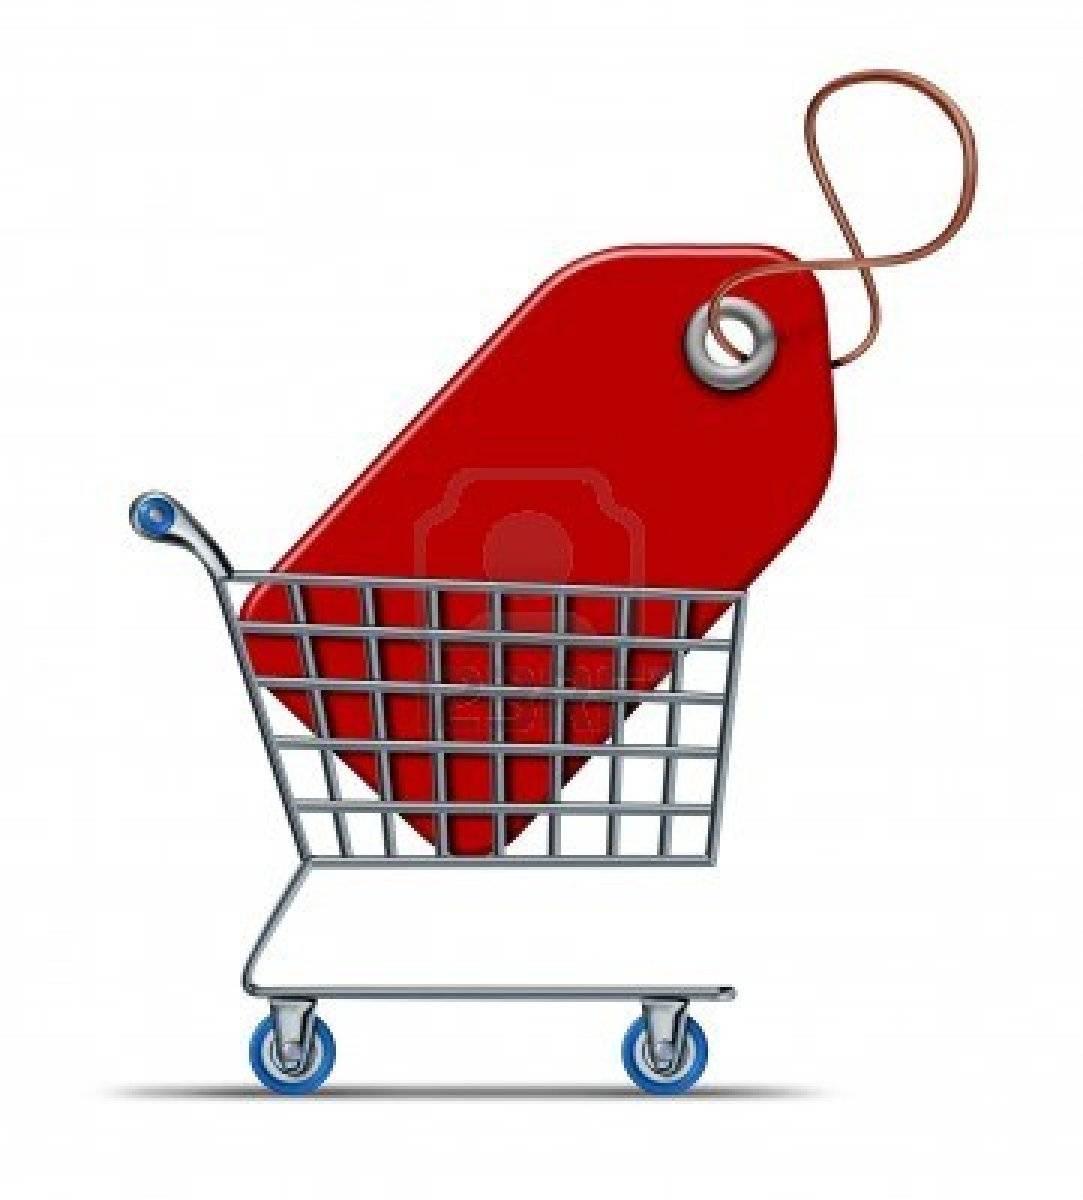 Price Tag in Shopping Cart - تعرفه خدمات خارج از منو فیلمبرداری و عکاسی